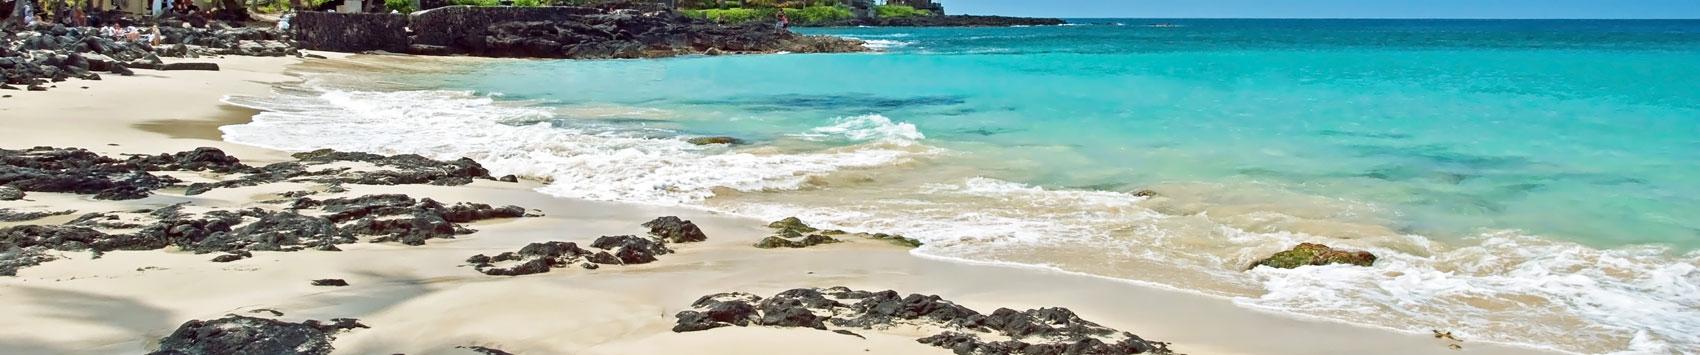 White Sand Beach Island Of Hawaii